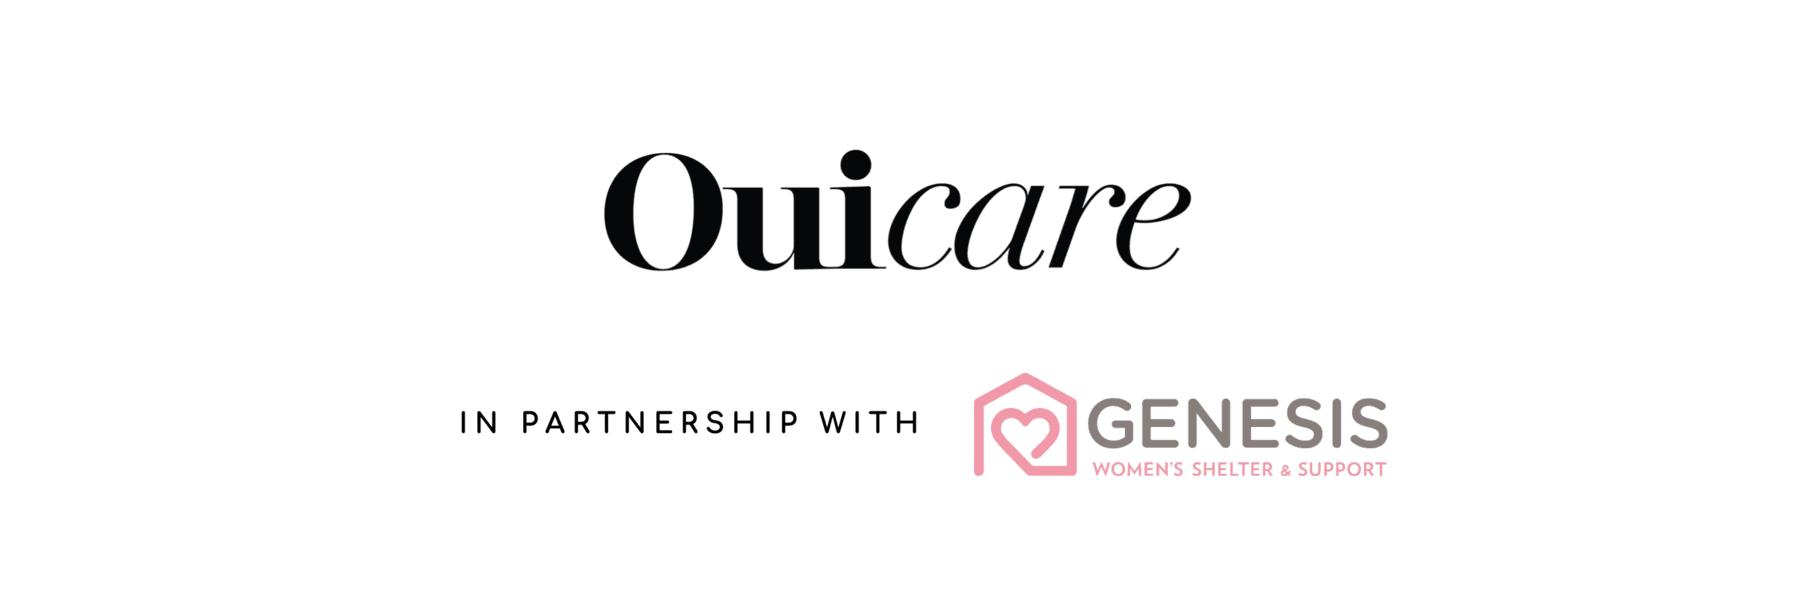 OUIPLEASE OUICARE GENESIS WOMEN'S SHELTER PARTNERSHIP logos